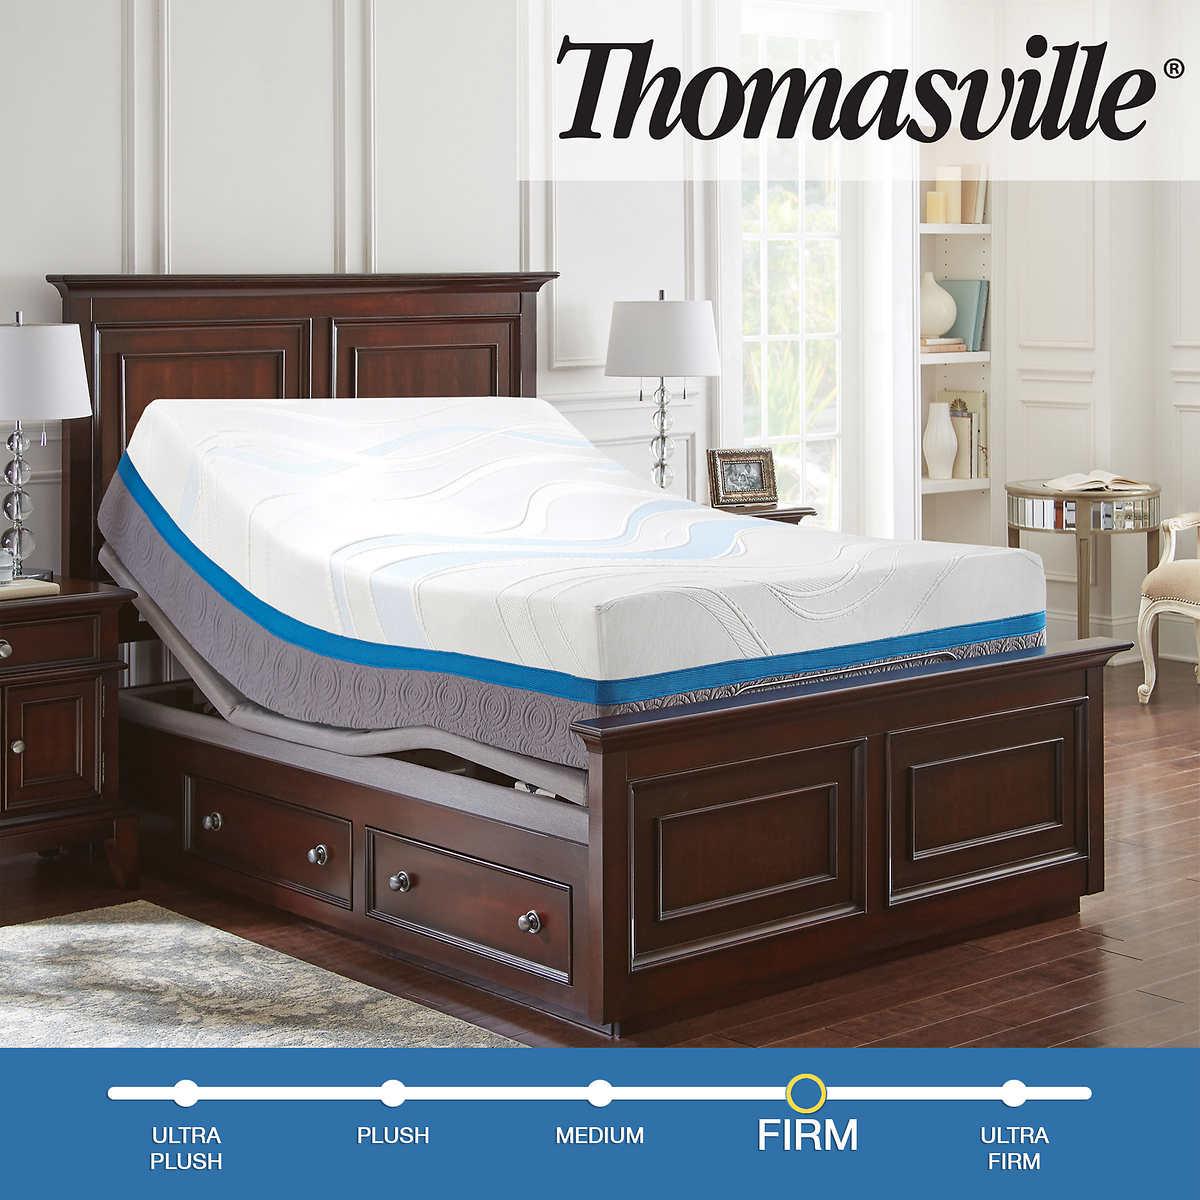 "Thomasville Precision Gel 14"" Memory Foam Queen Mattress with Adjustable  Base"